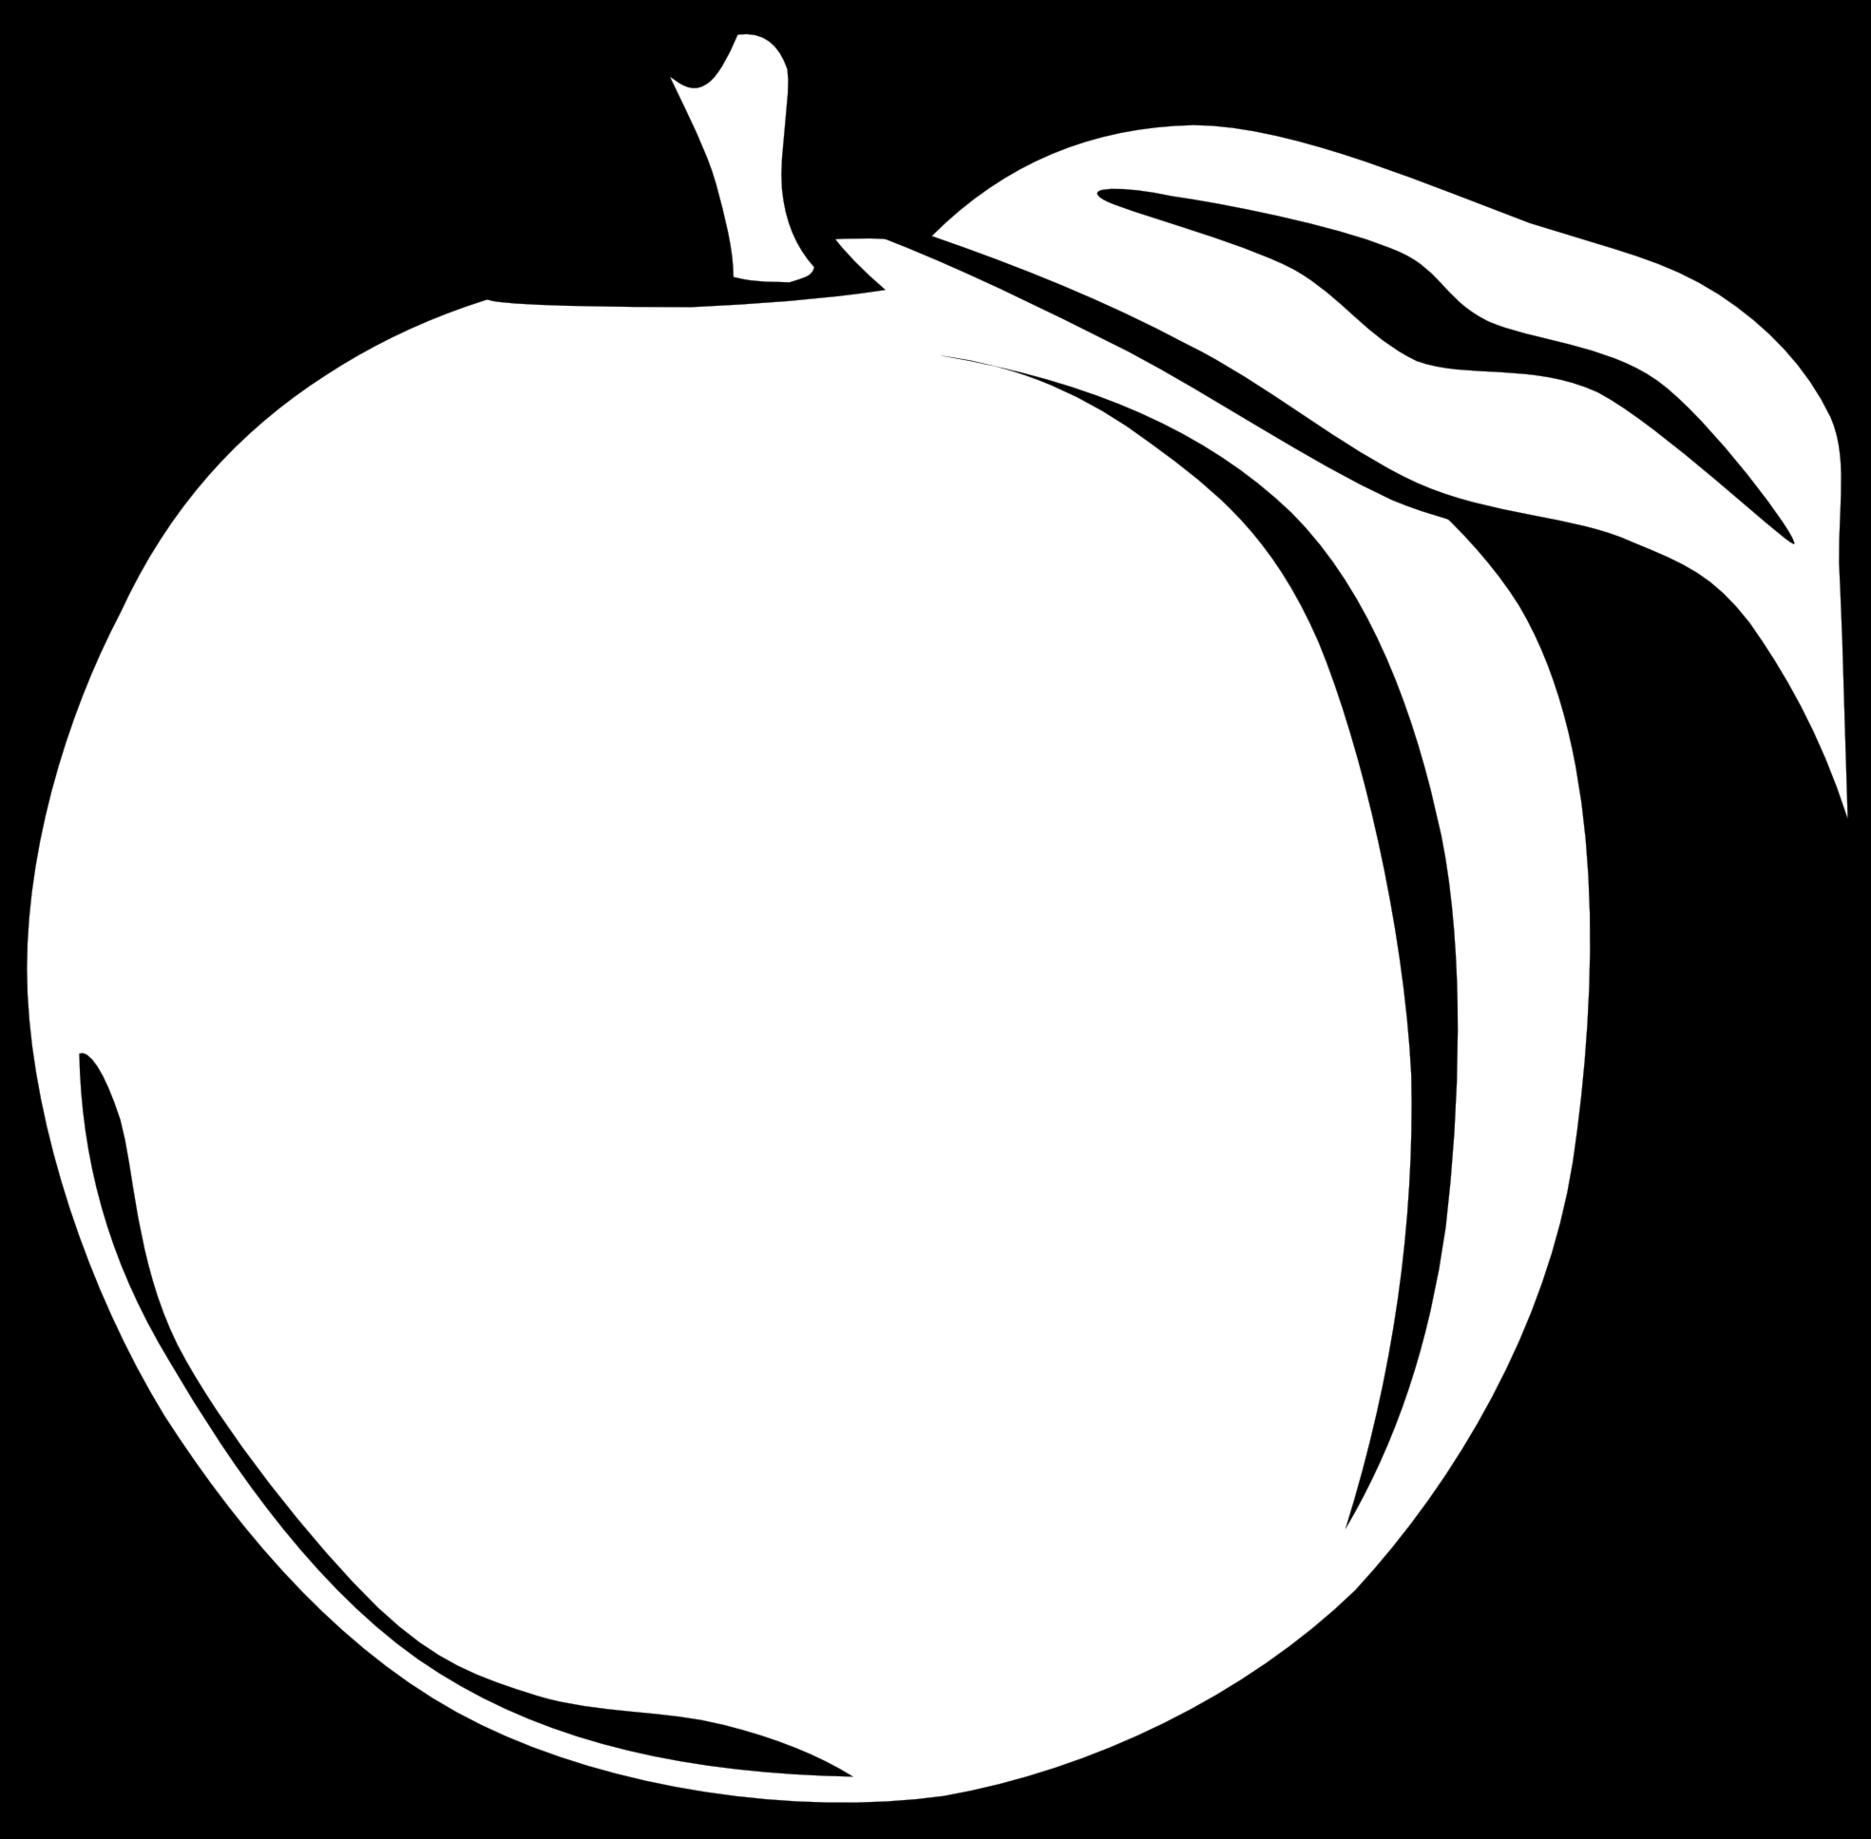 jpg freeuse stock Oranges clipart black and white. Apple fruit fruitsblack free